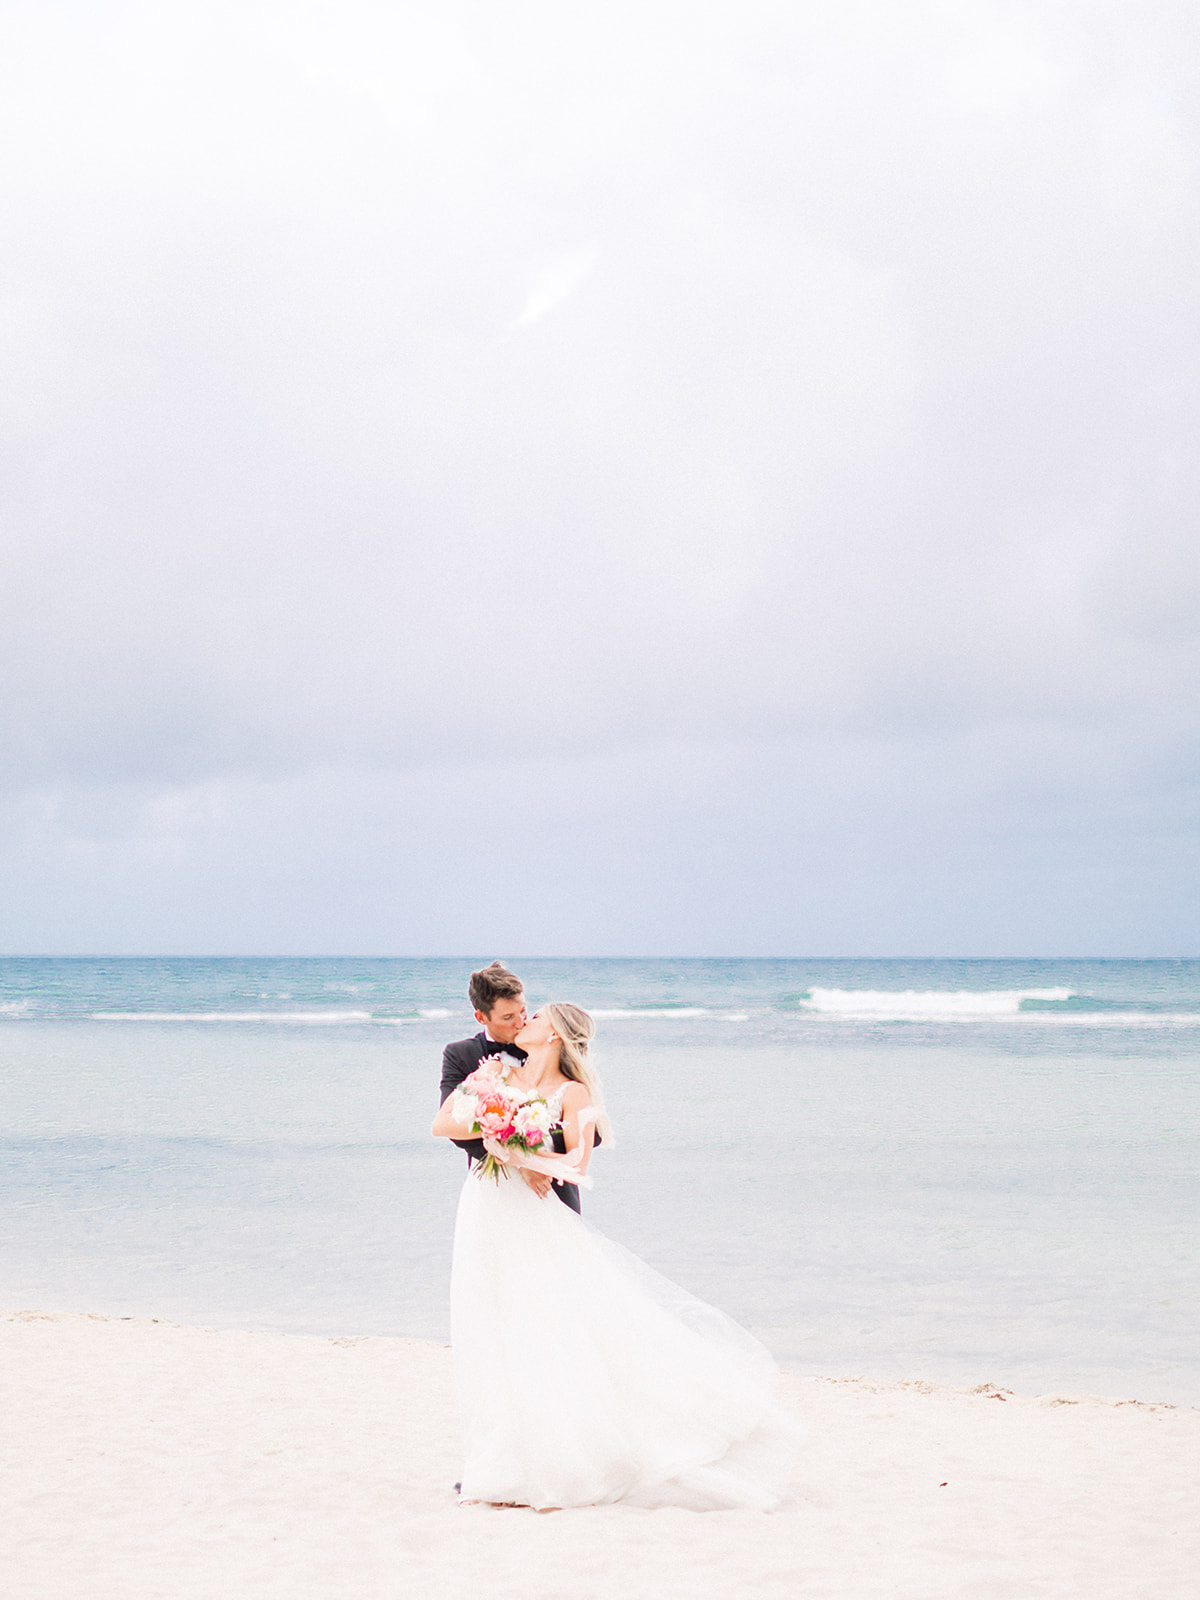 Dominican Republic Wedding: Beach Wedding Inspiration | Dominican Republic